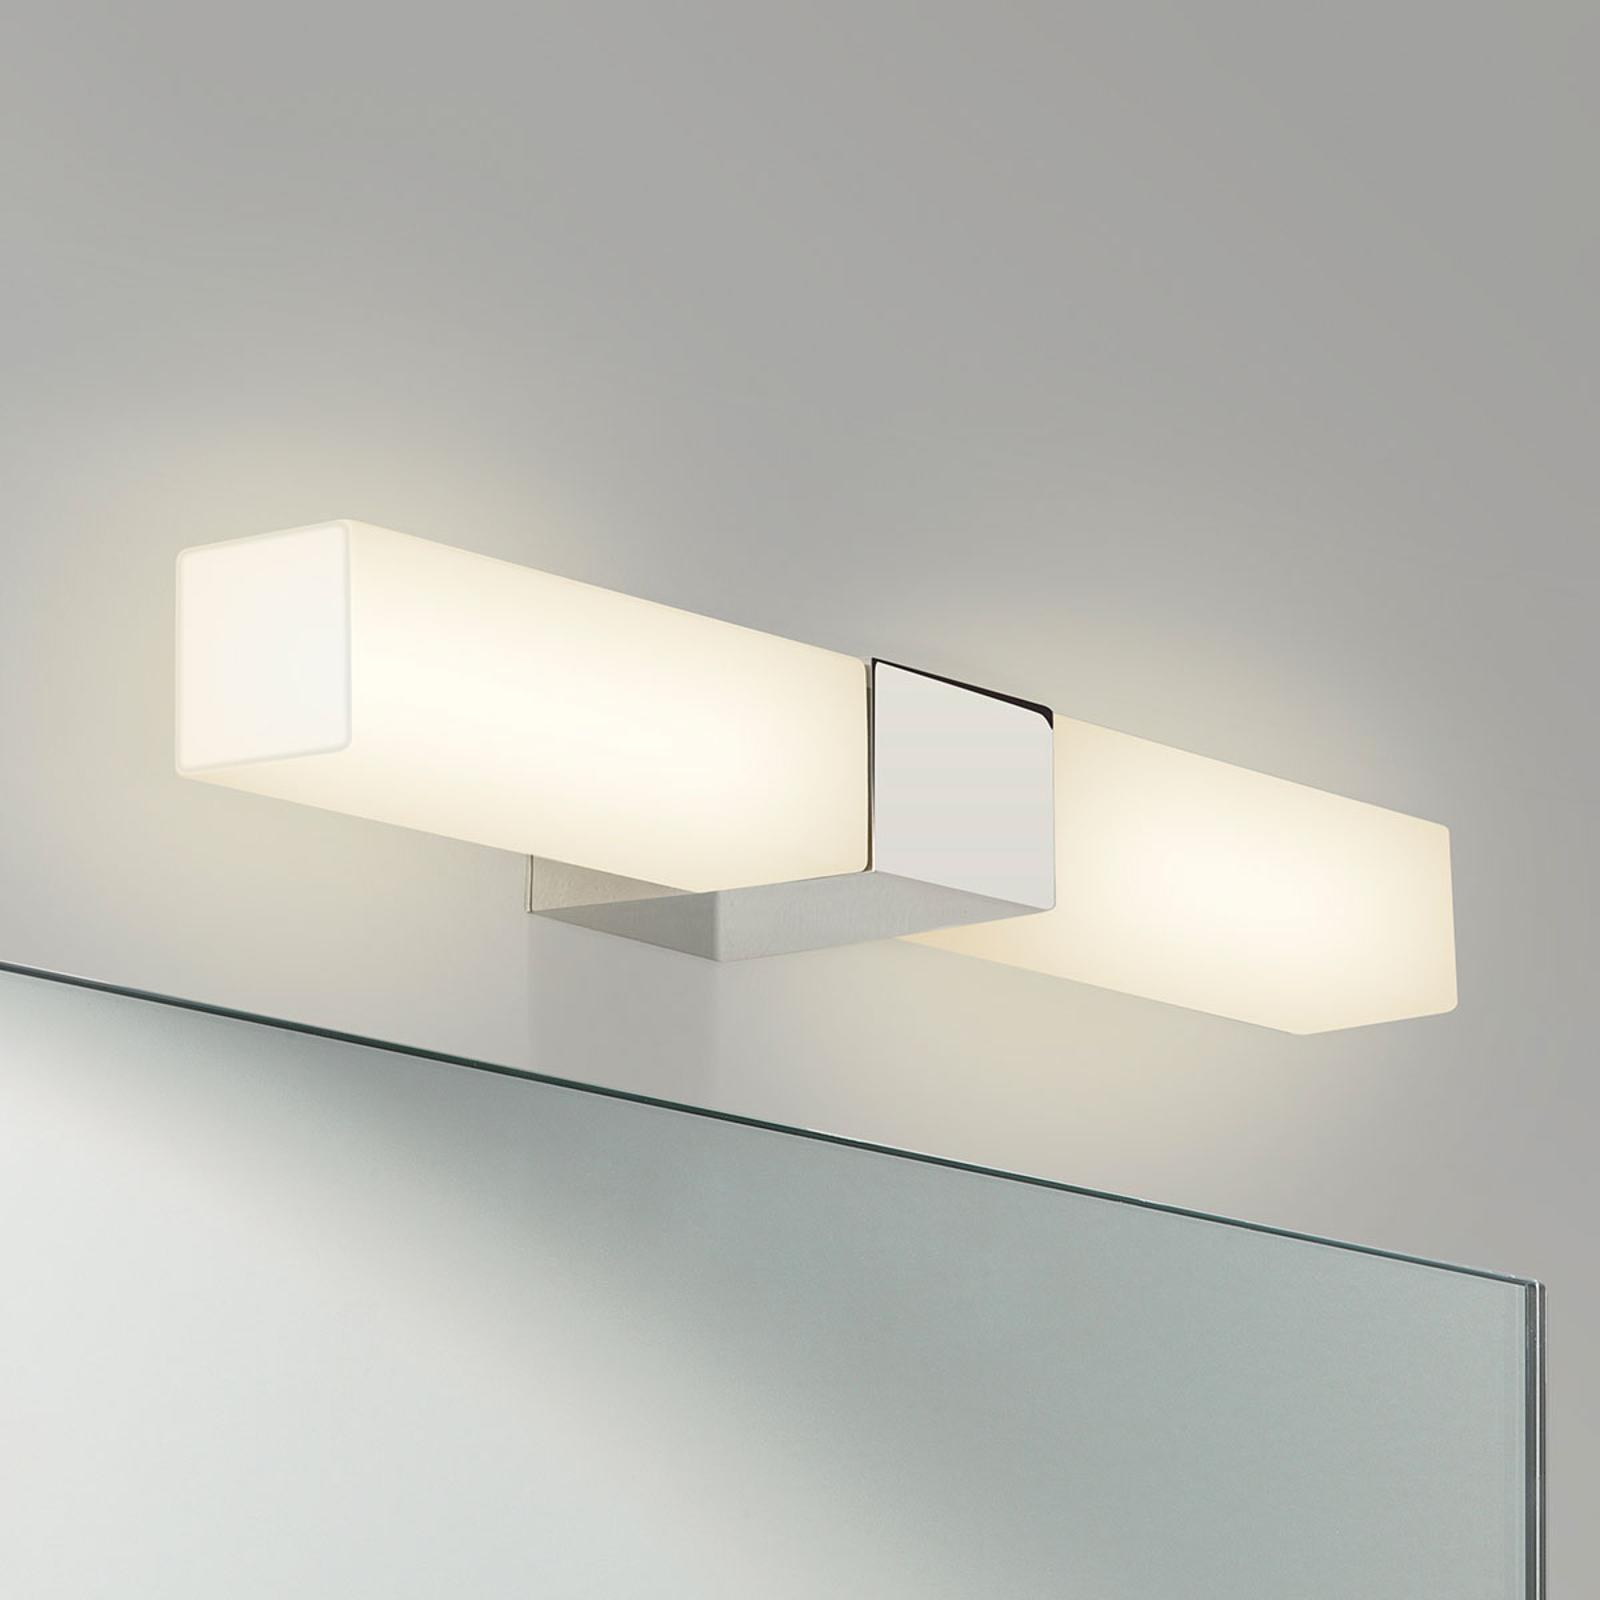 Astro Padova Square wandlamp voor badkamers